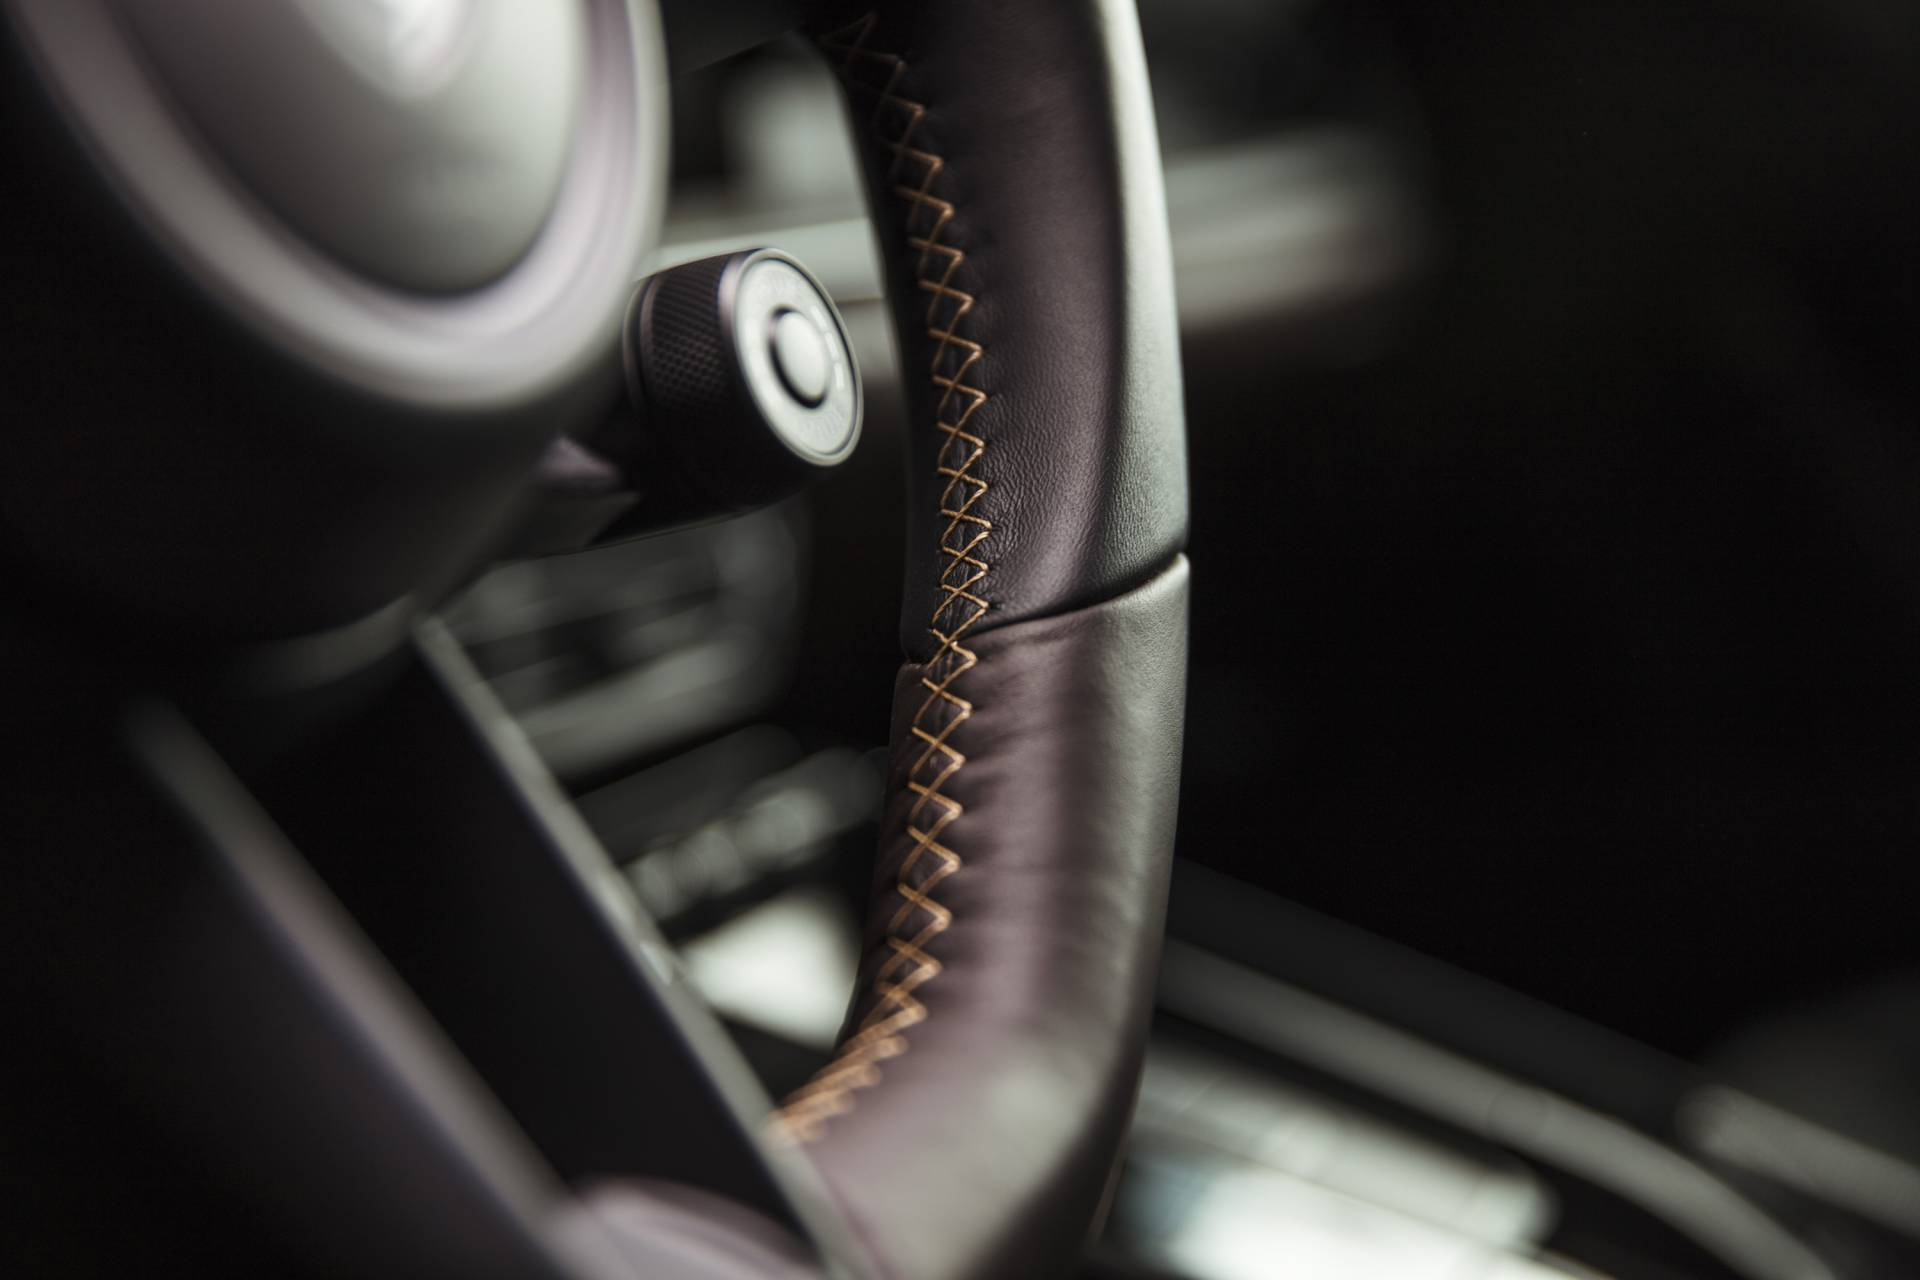 Chi tiet Porsche 911 2020 lot xac man nhan voi goi do thu cong hinh anh 42